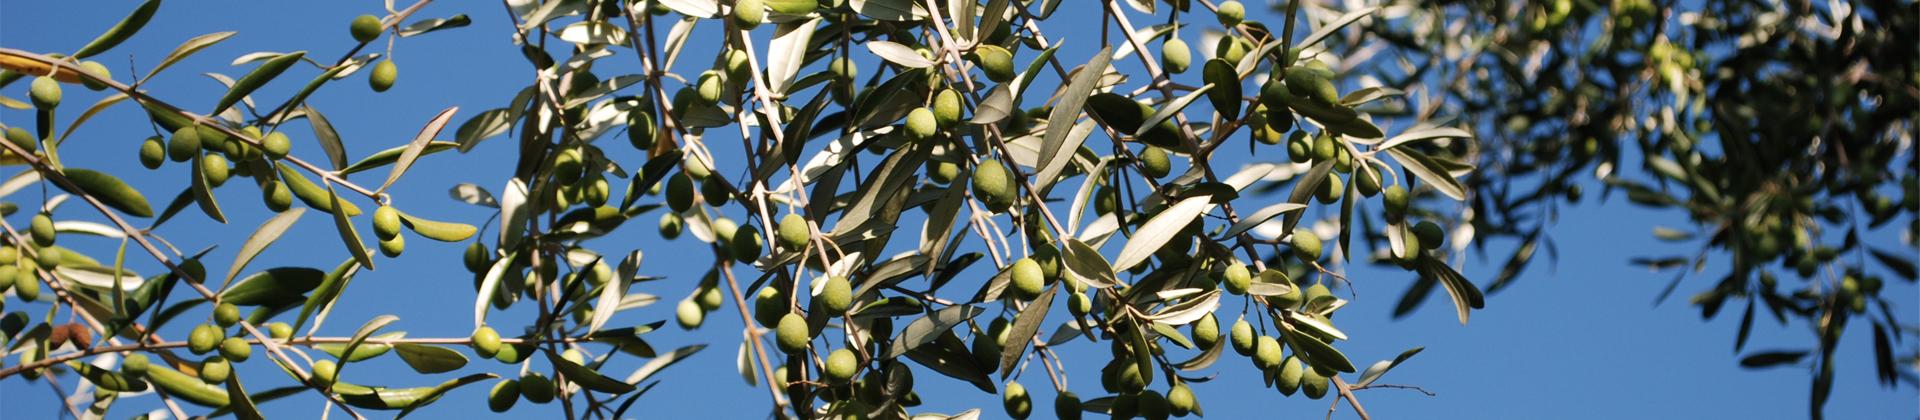 olive_banner.jpg